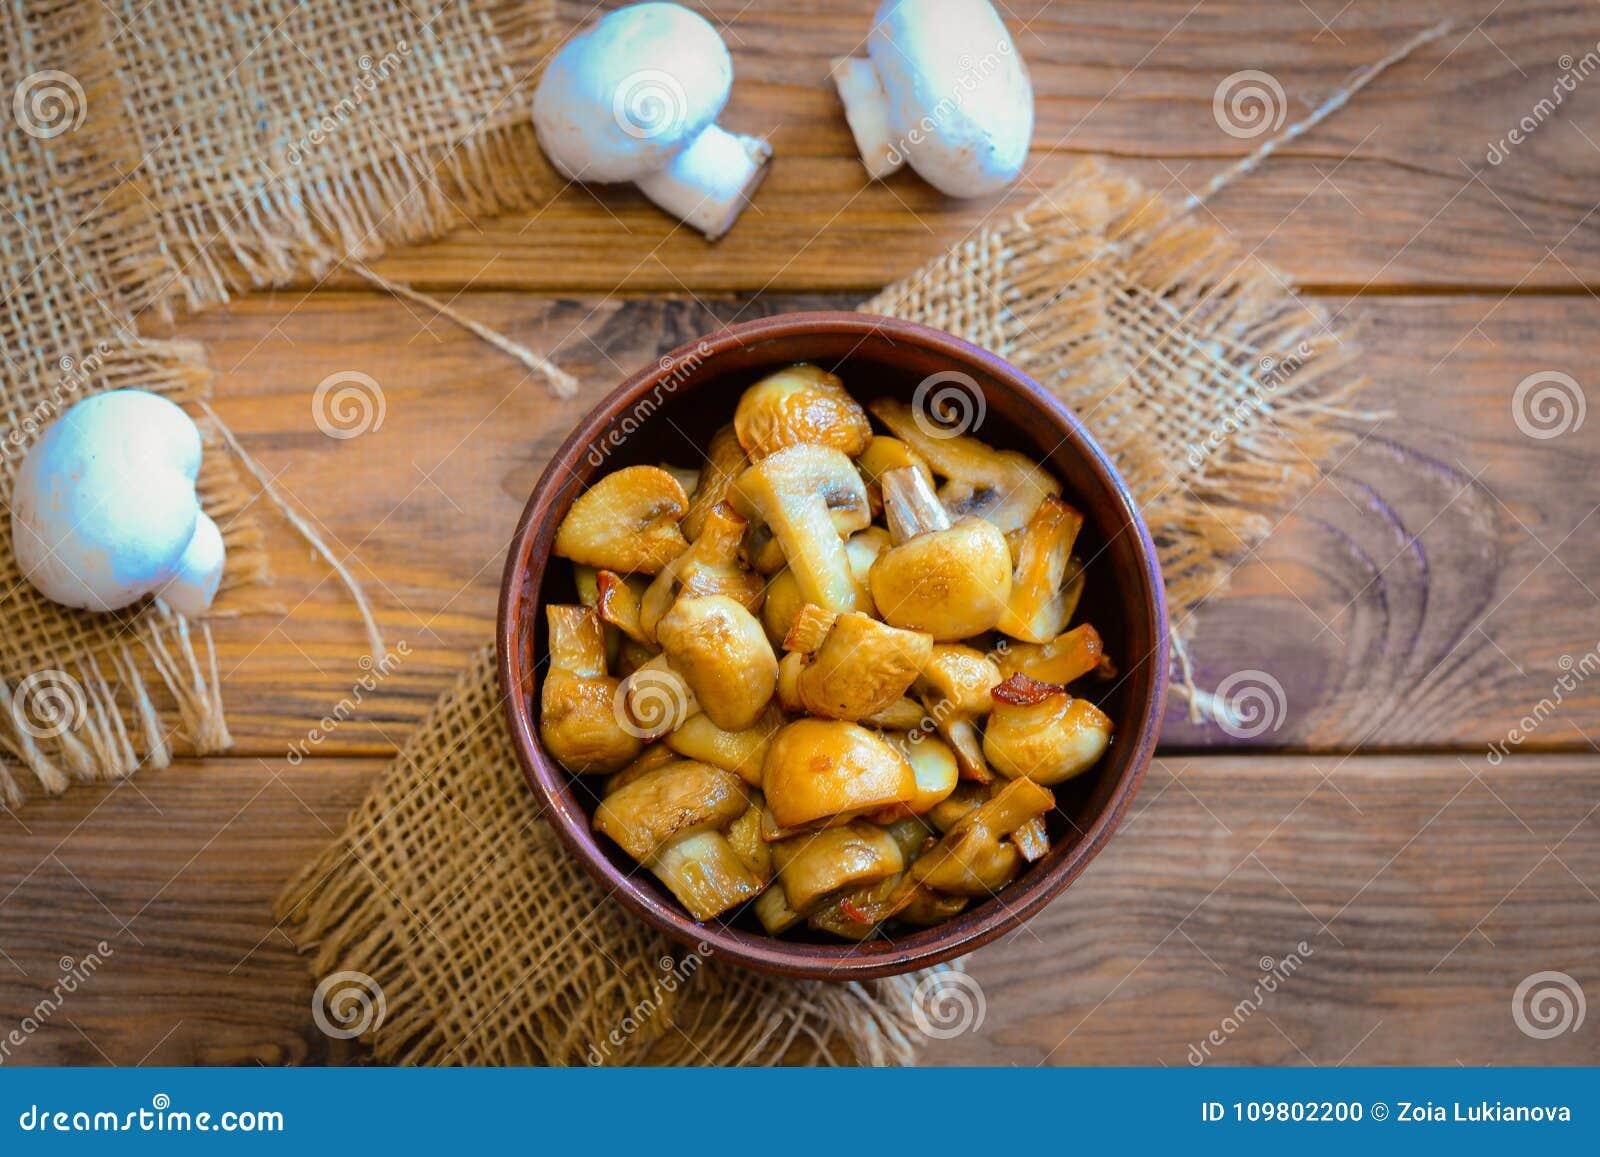 Roasted Mushrooms Homemade Roasted Mushrooms In A Bowl On A